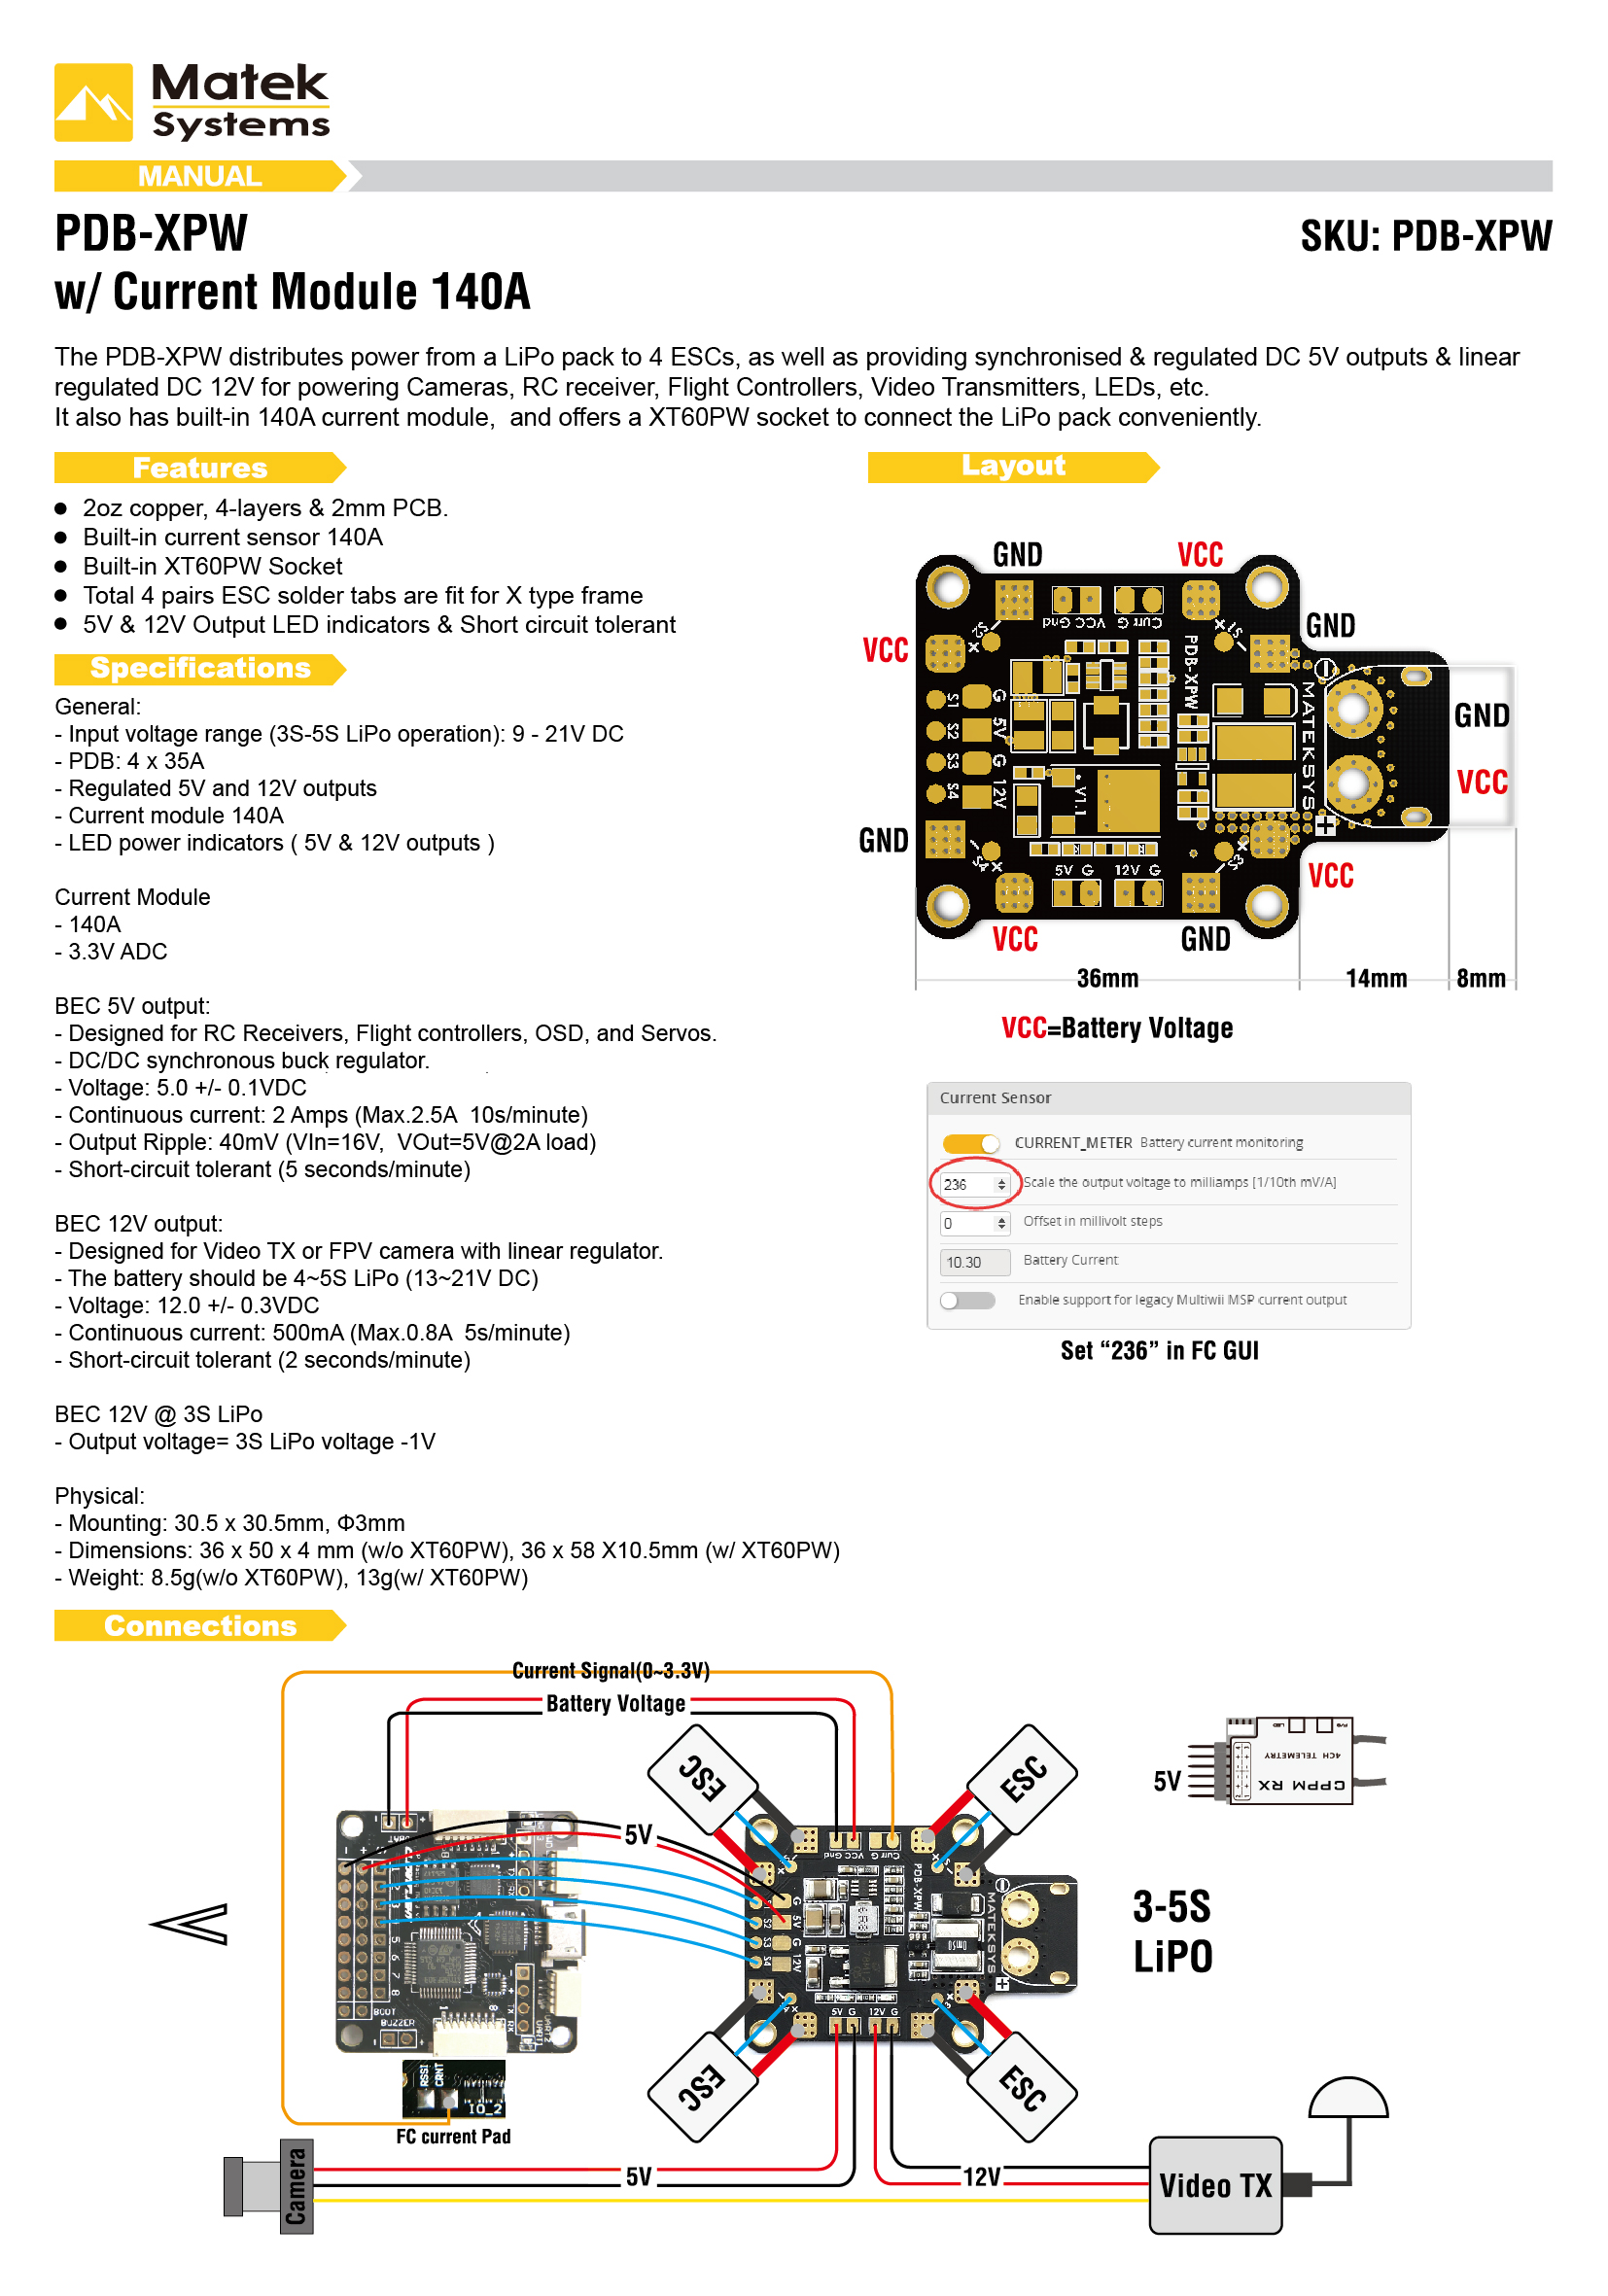 Diagram Wiring To Cc3d Pdb Xpw 30 Images Bluetooth Manualt1490673007 Matek W Current Sensor 140a 5v 12v